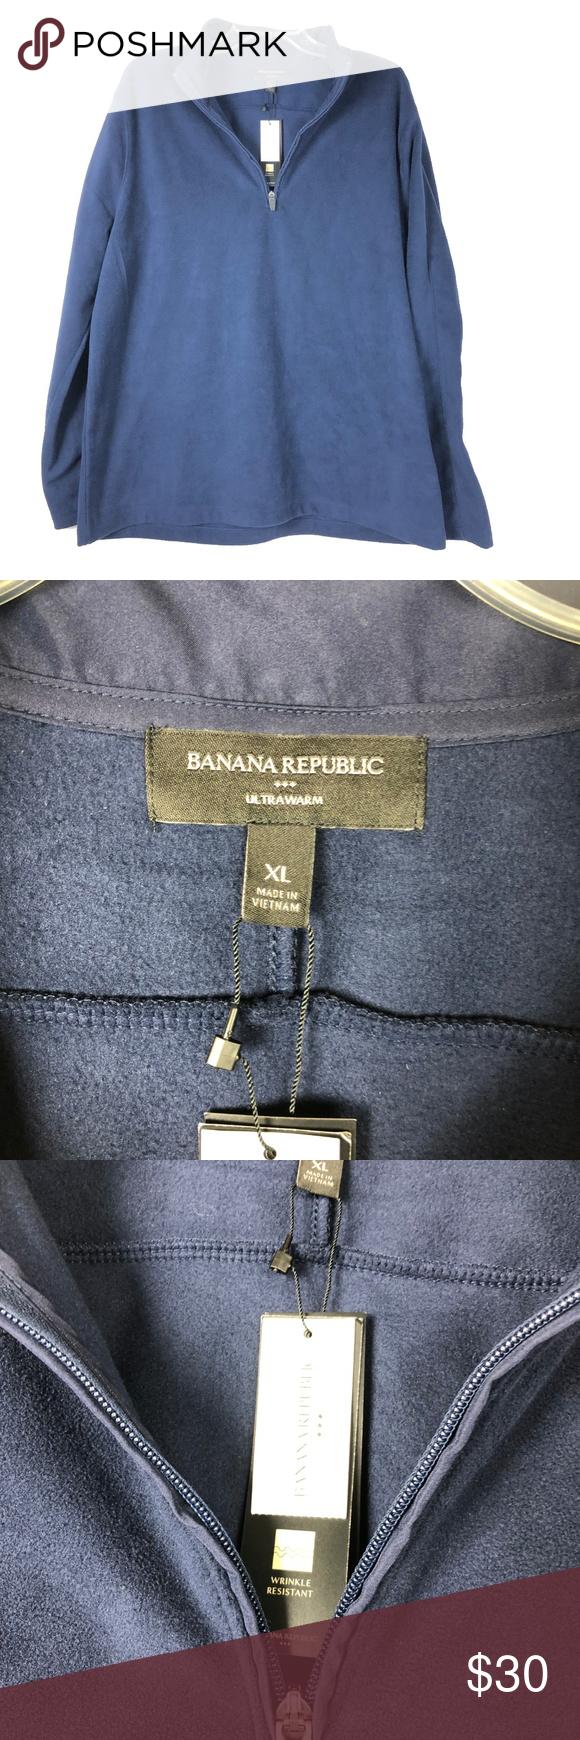 Nwt Banana Republic Mens Ultrawarm Sweatshirt 02e Sweatshirts Banana Republic Banana Republic Sweater [ 1740 x 580 Pixel ]